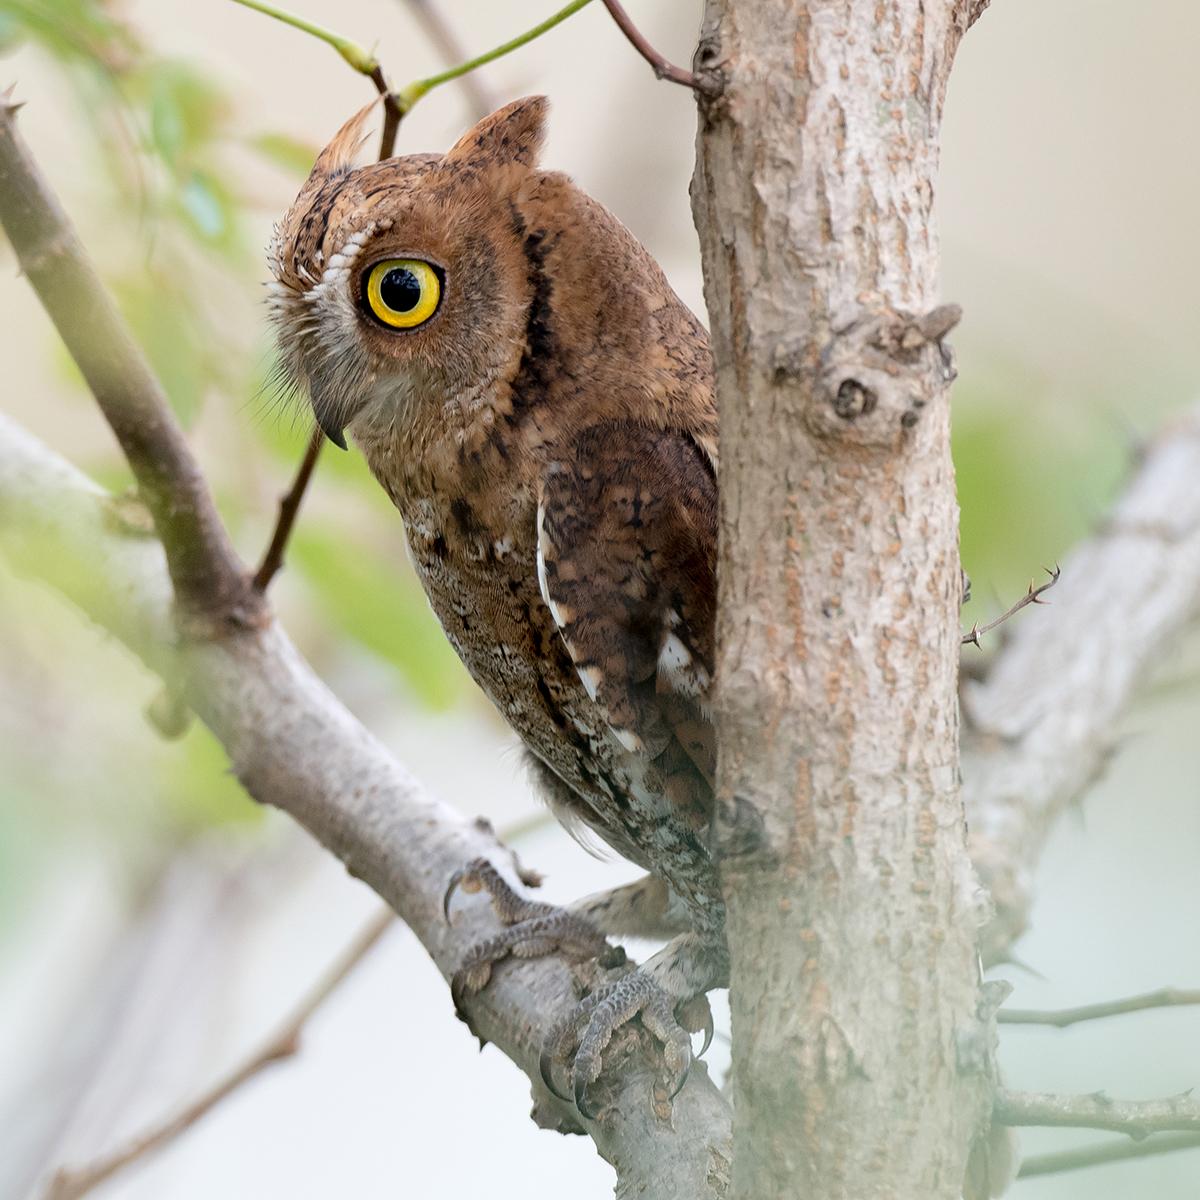 Oriental Scops Owl, Cape Nanhui, Shanghai, China, 2017. (Kai Pflug)